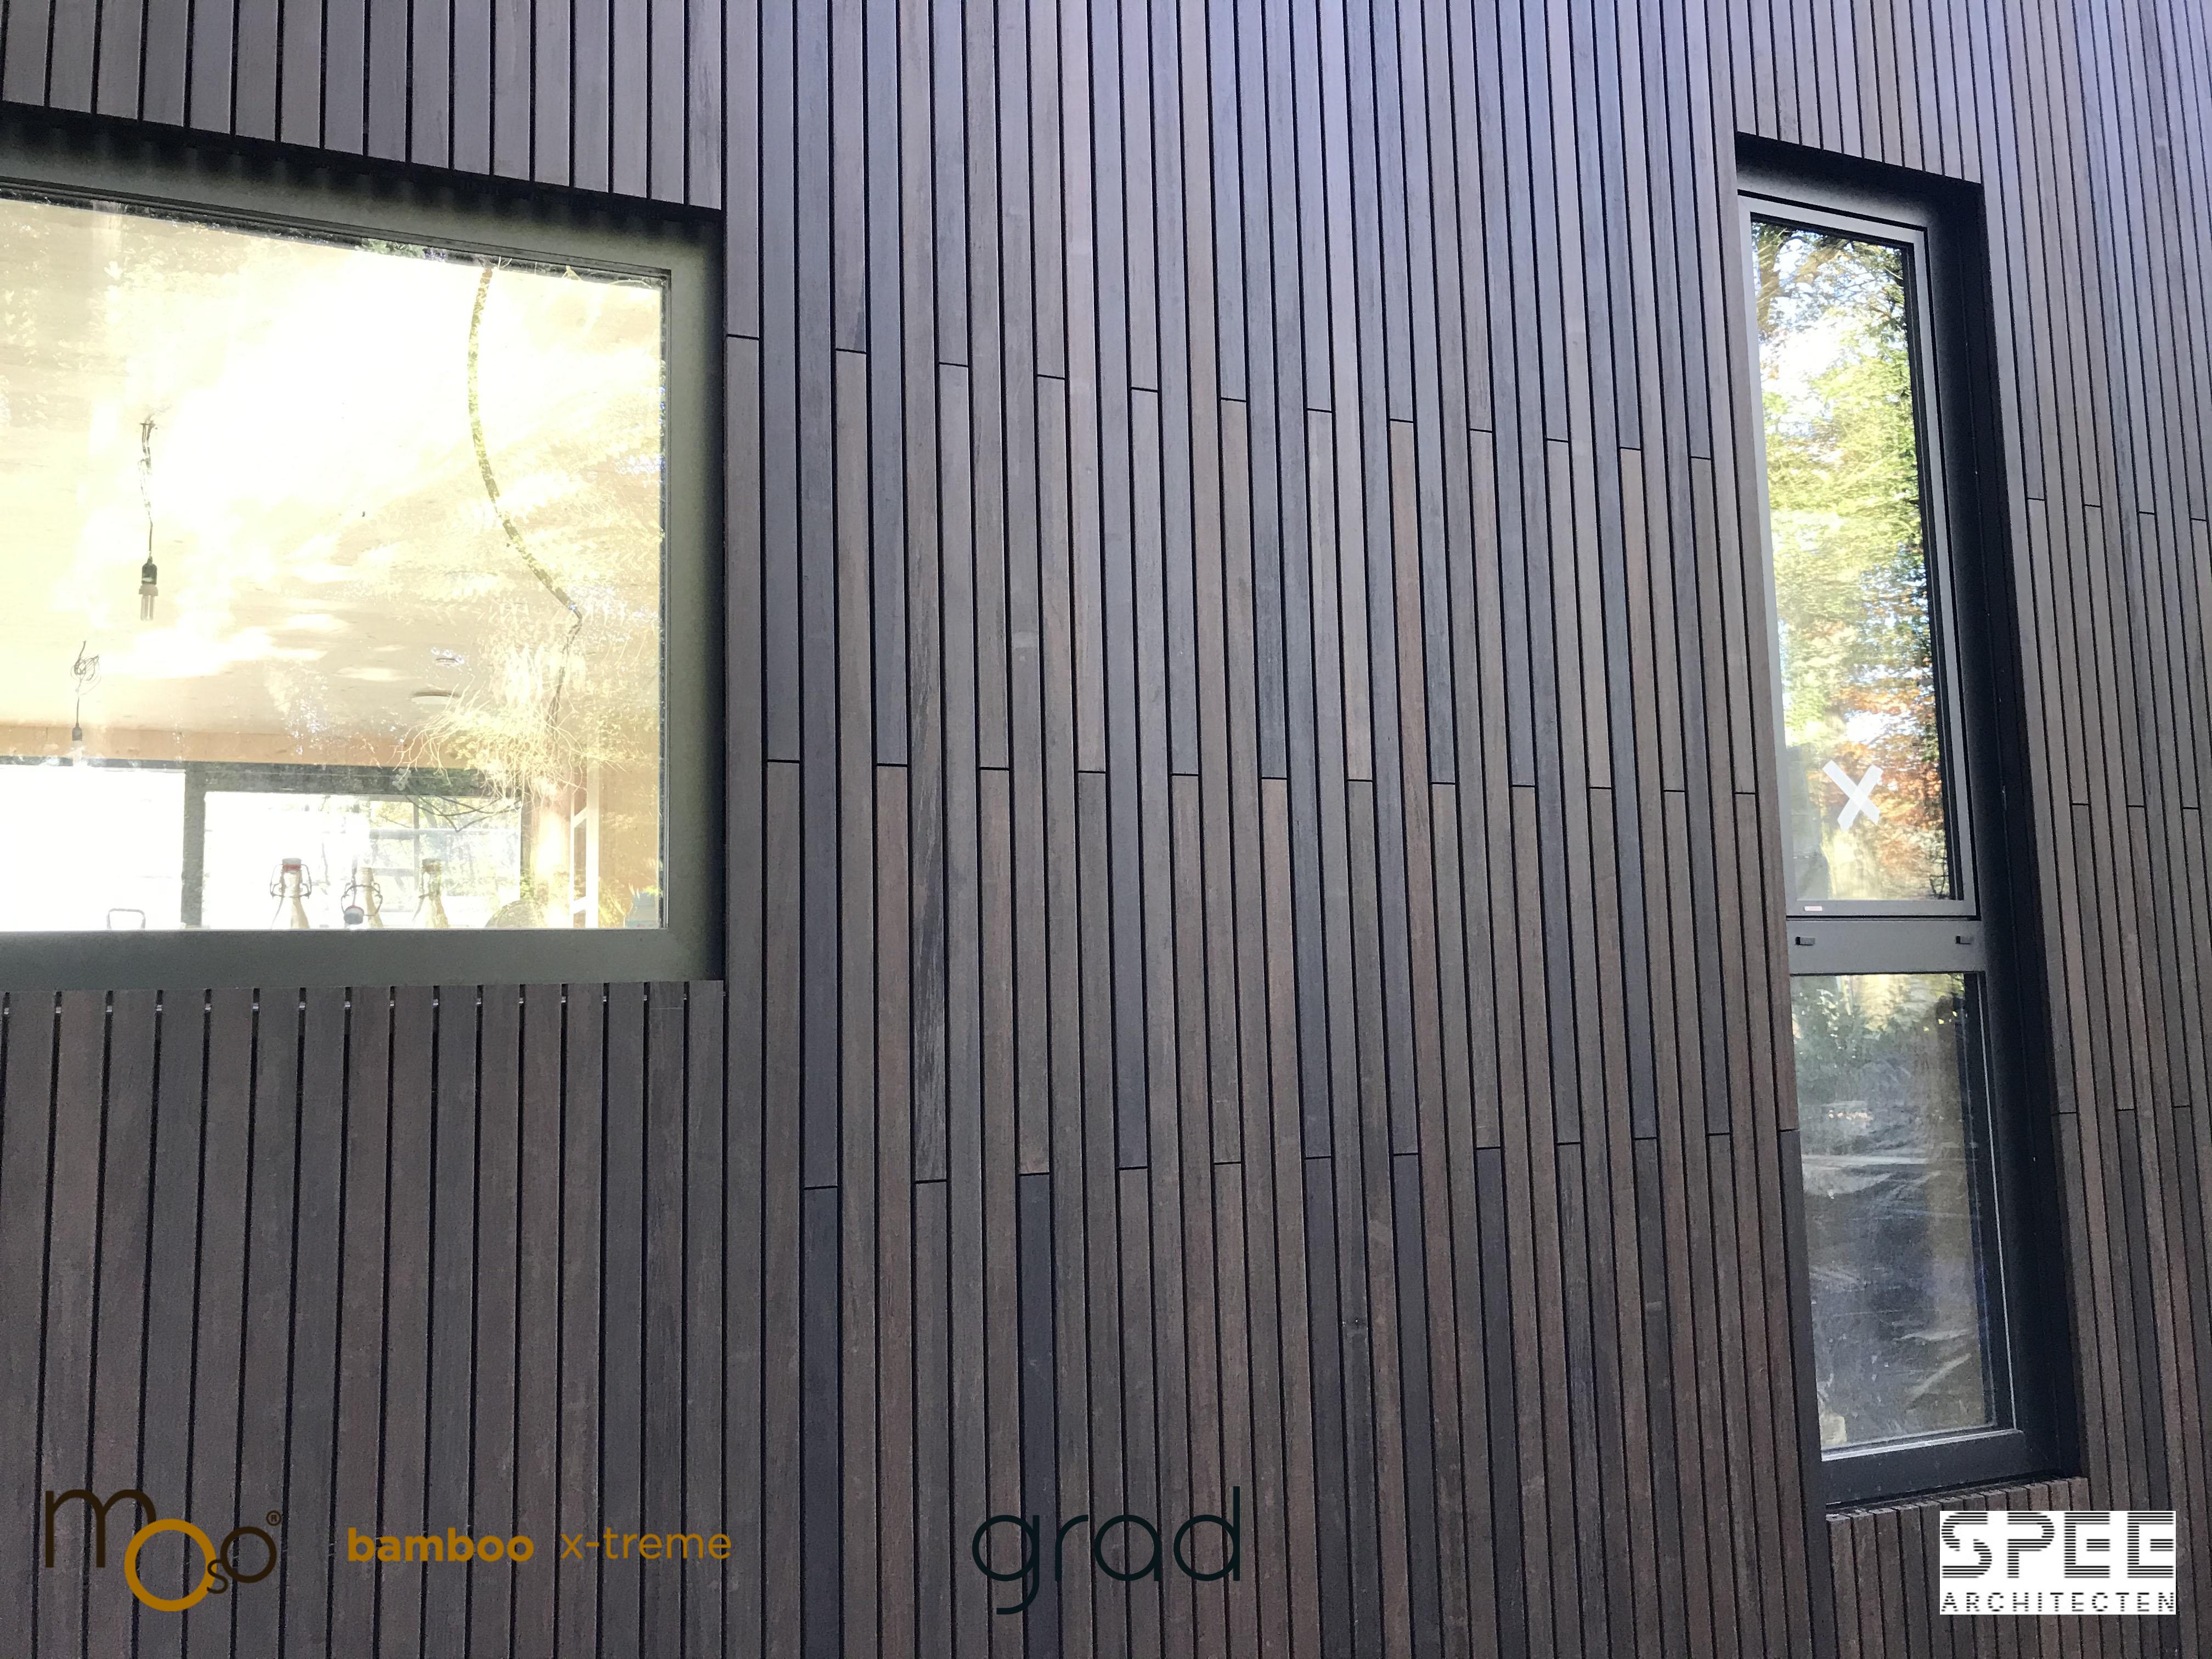 Moso Bamboo Xtreme GRAD Spee Architecten 2